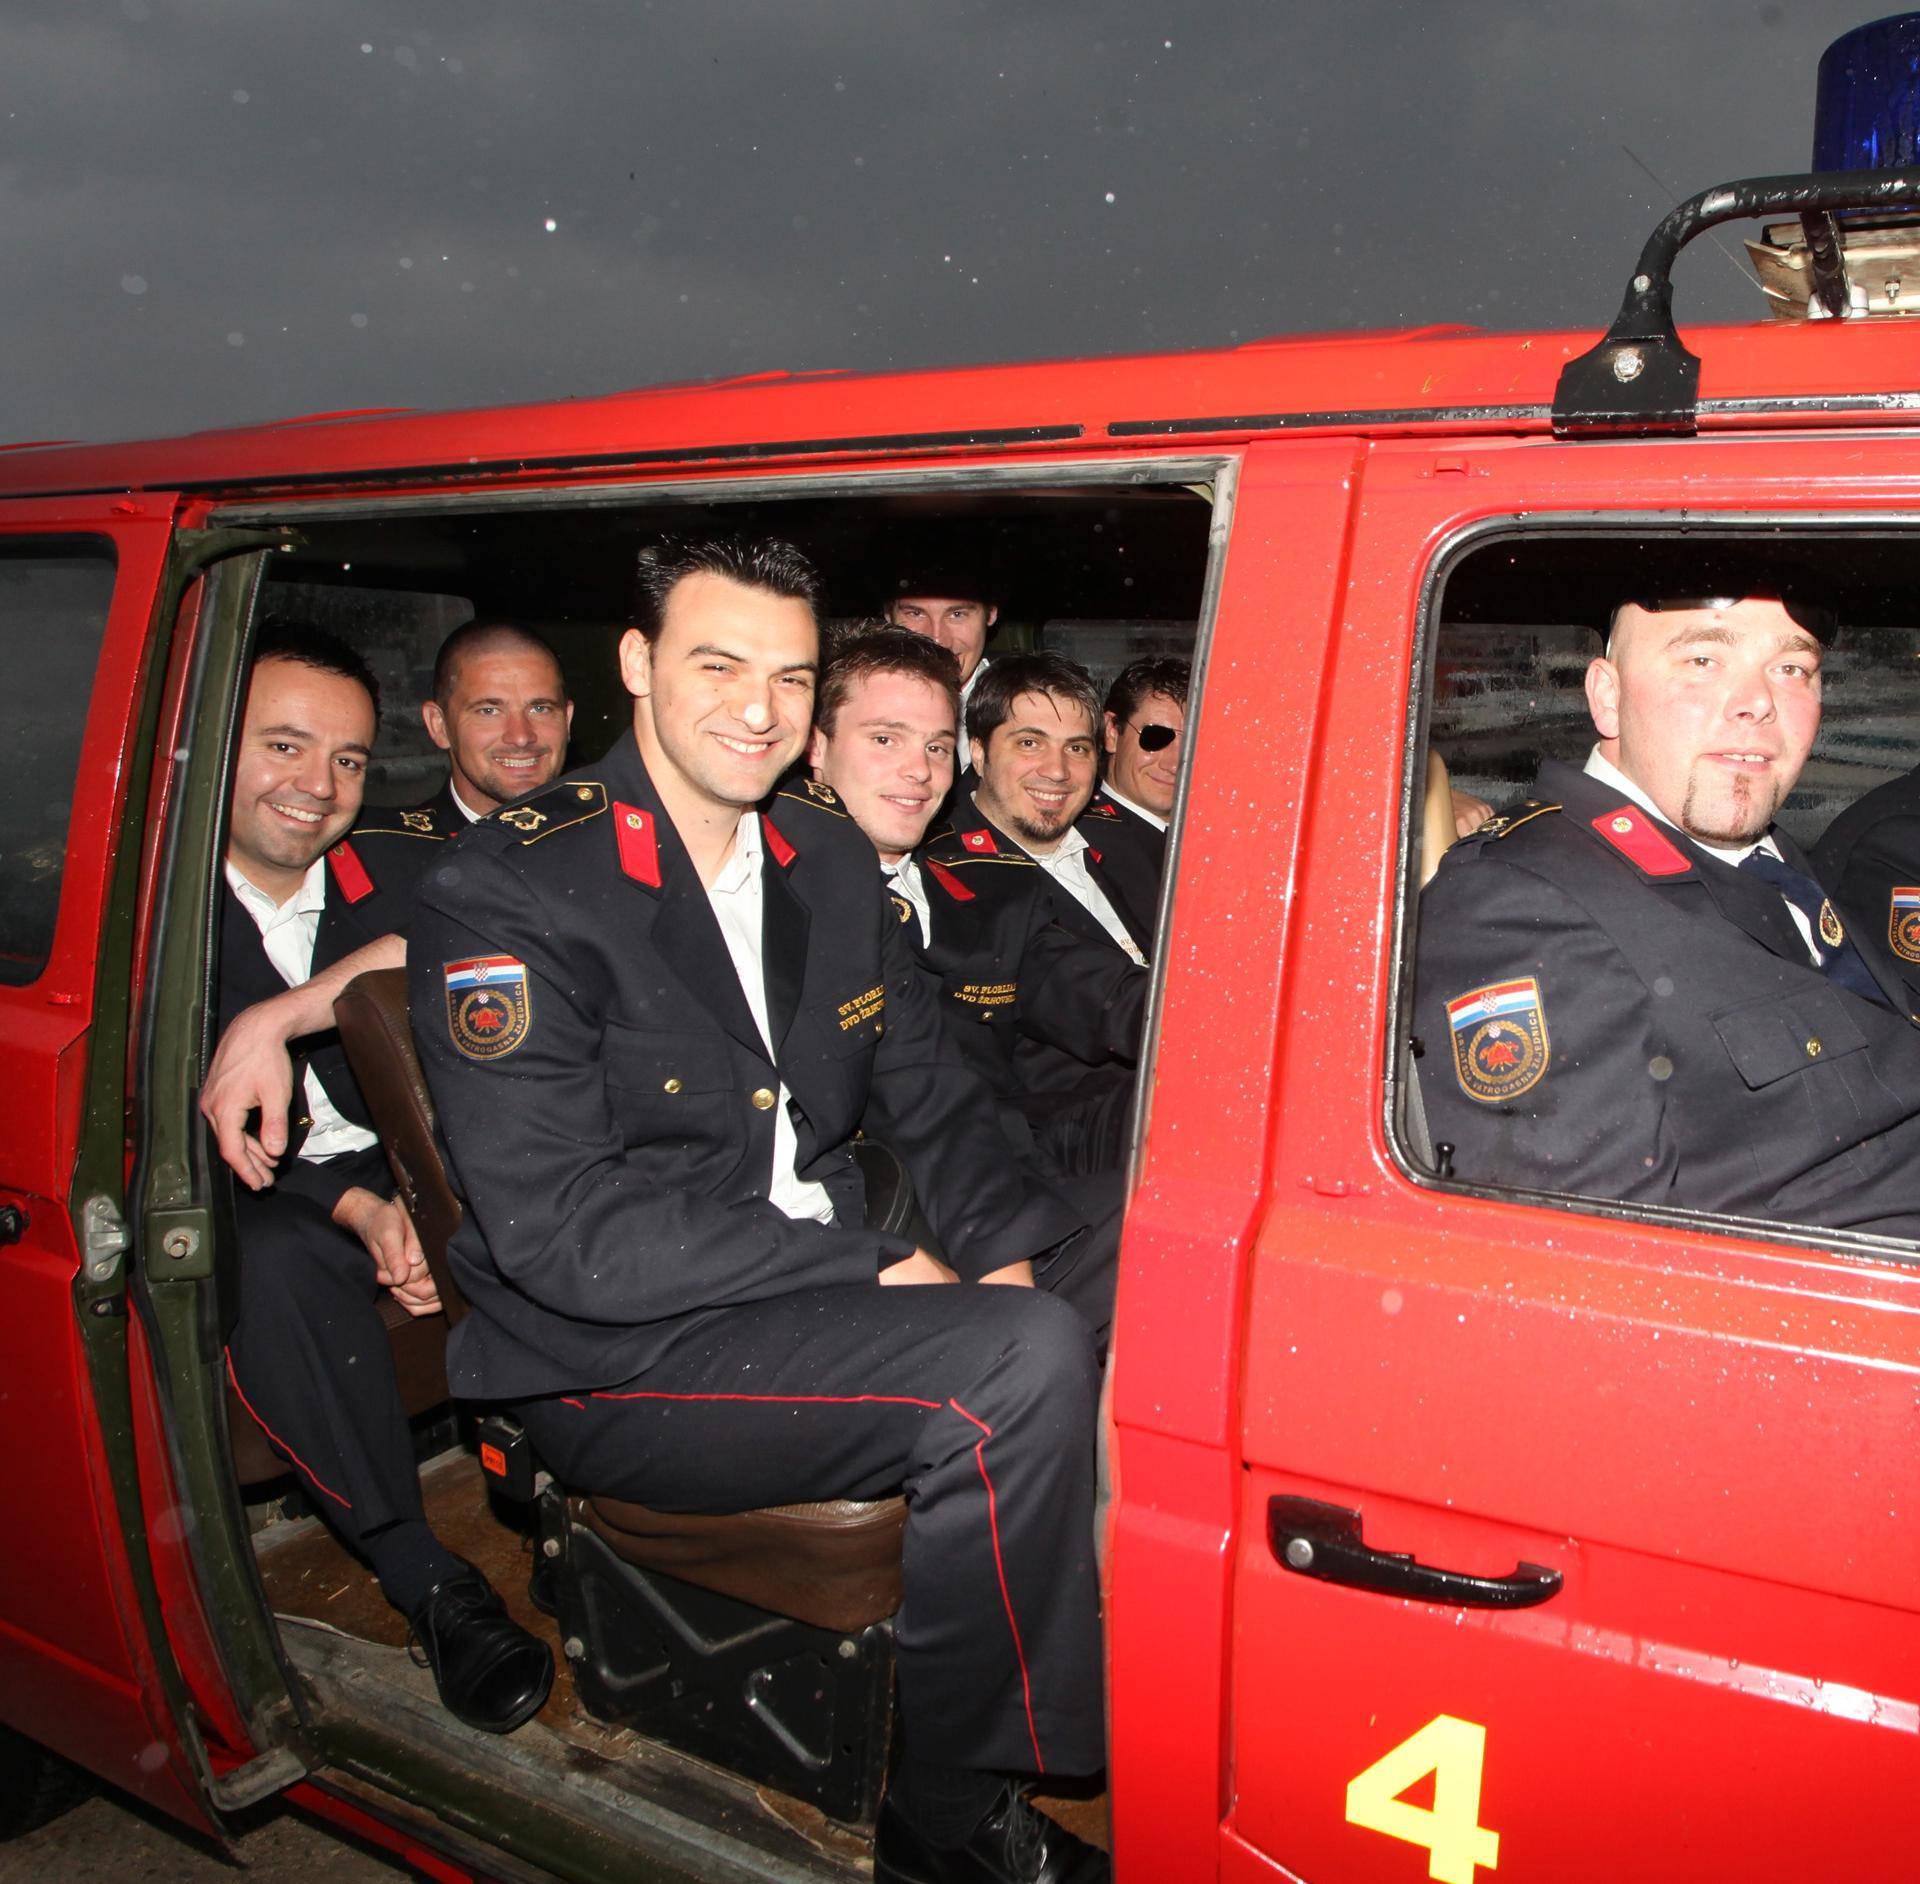 Prva vatrogasna klapa nakon požara spremna je na pjesmu